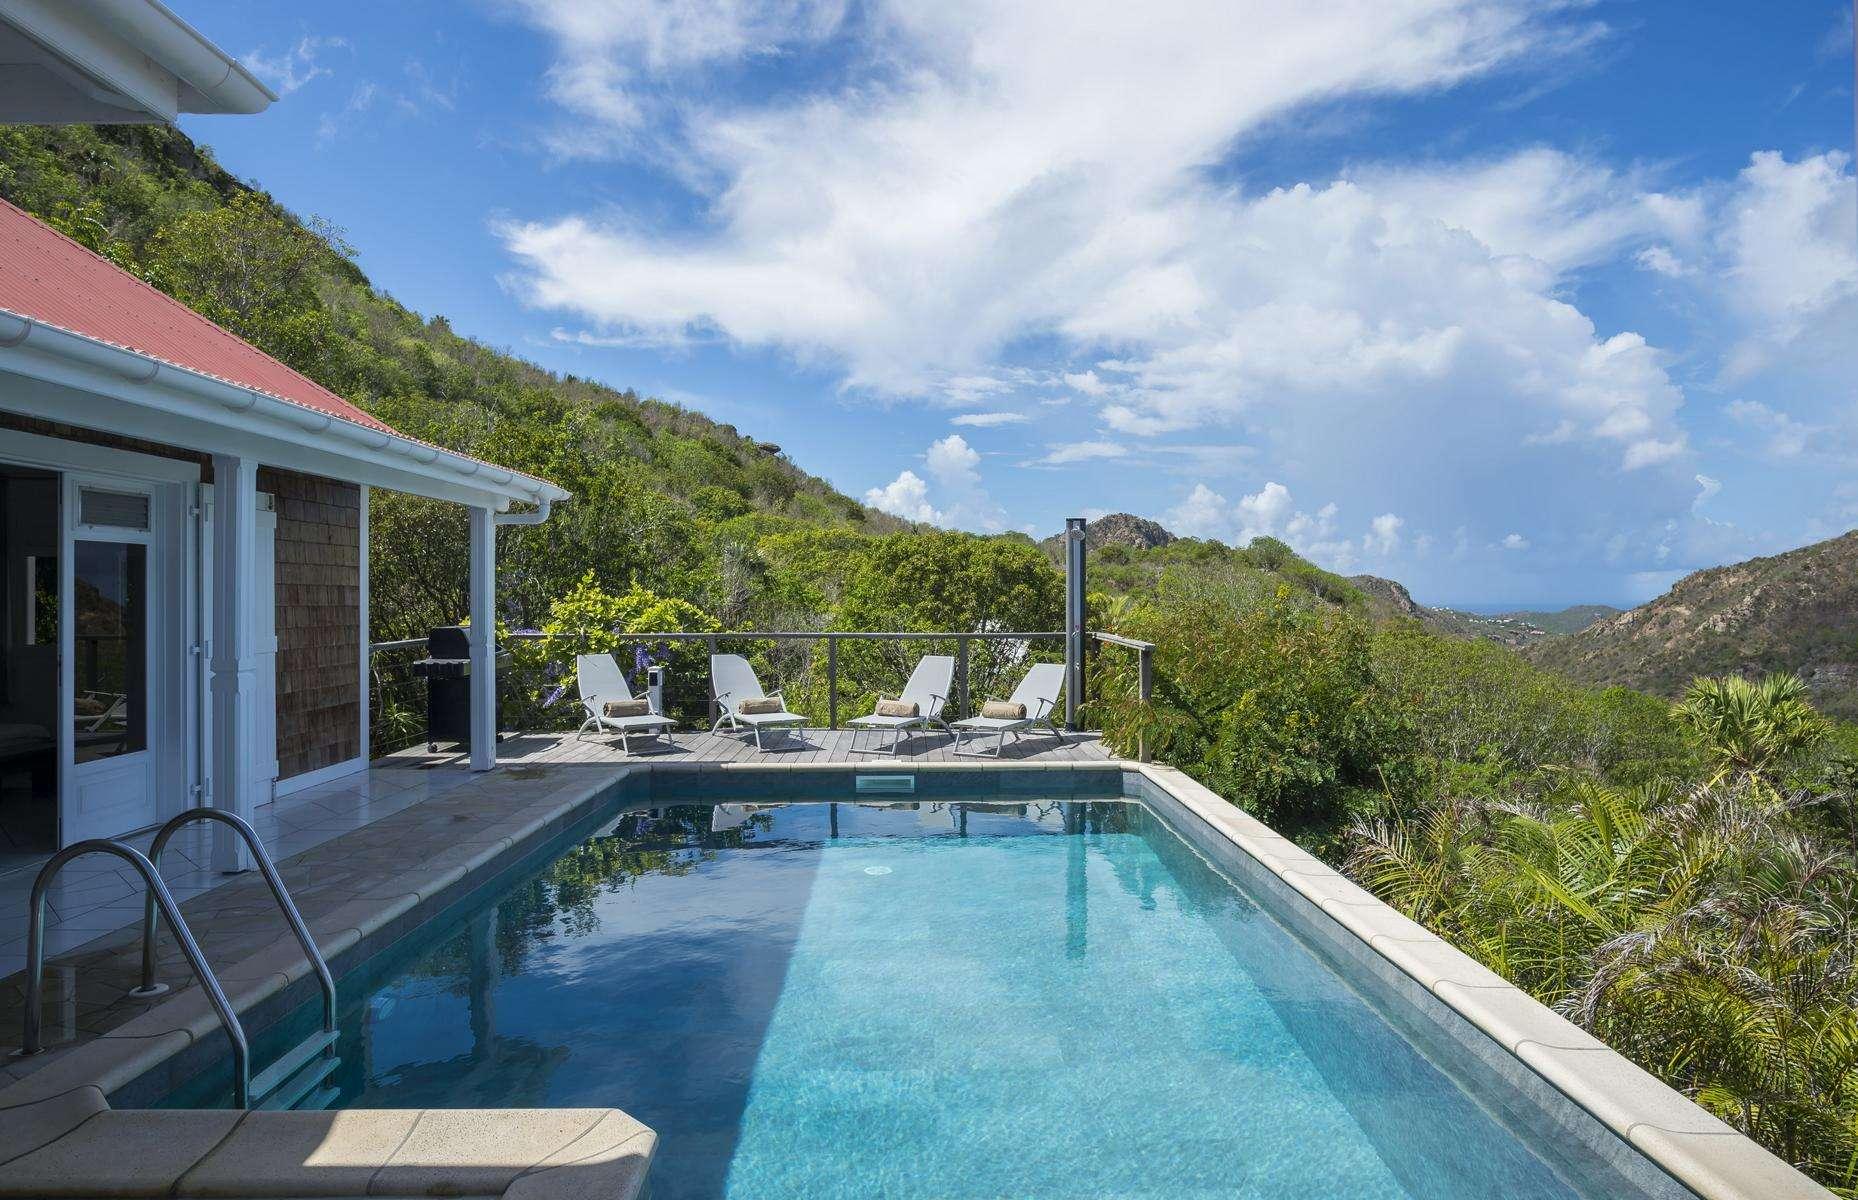 Luxury villa rentals caribbean - St barthelemy - Vitet - No location 4 - Anais - Image 1/11